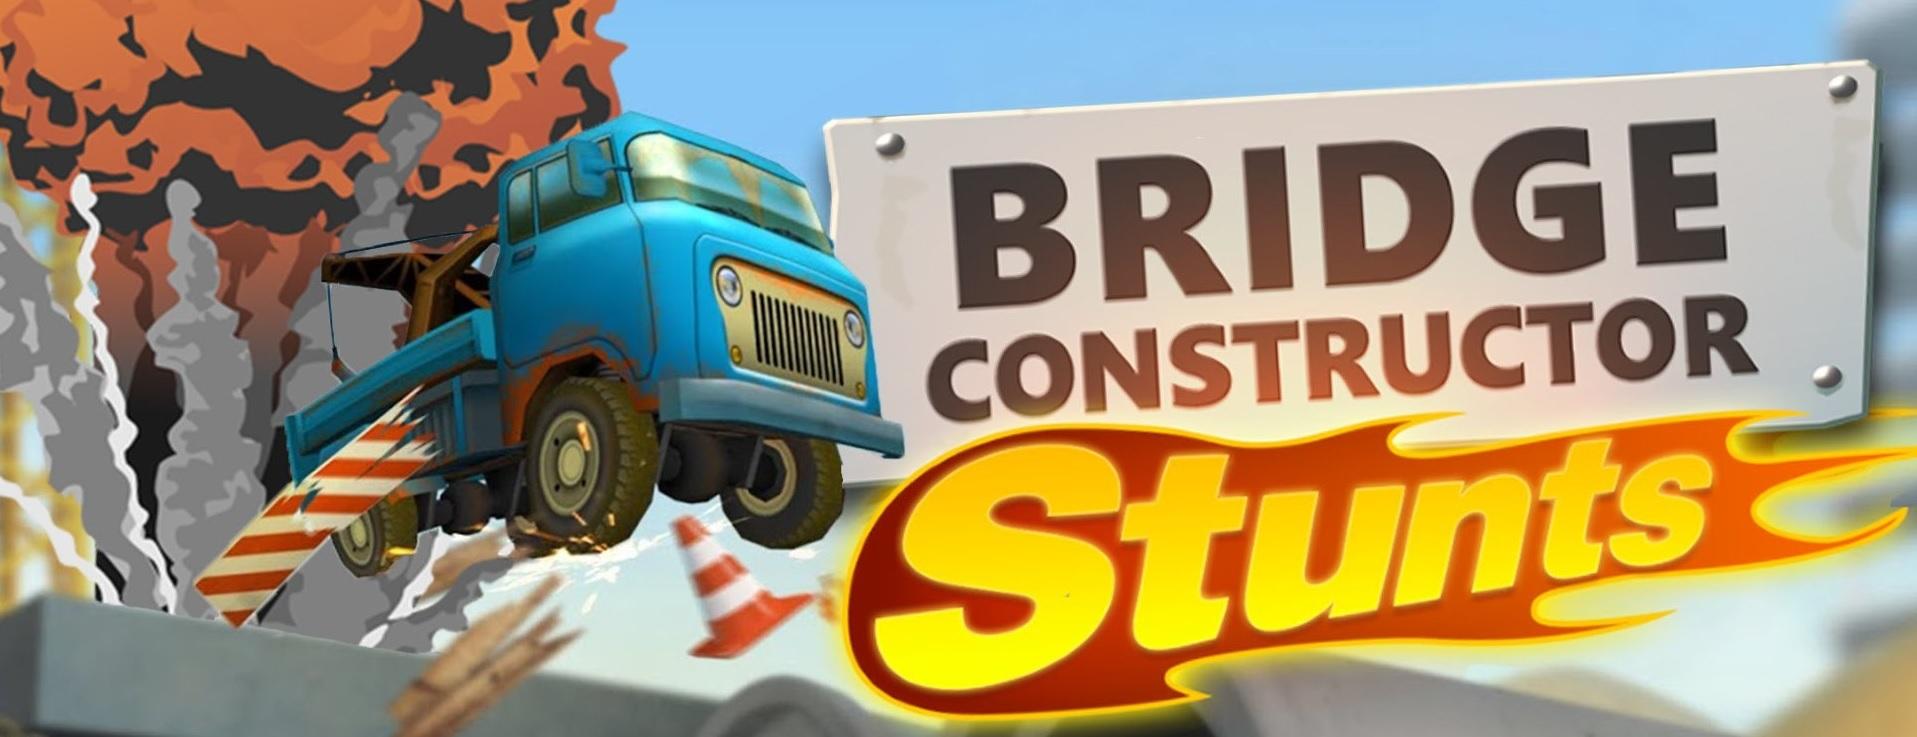 bride-constructor-stuuqofi.jpg